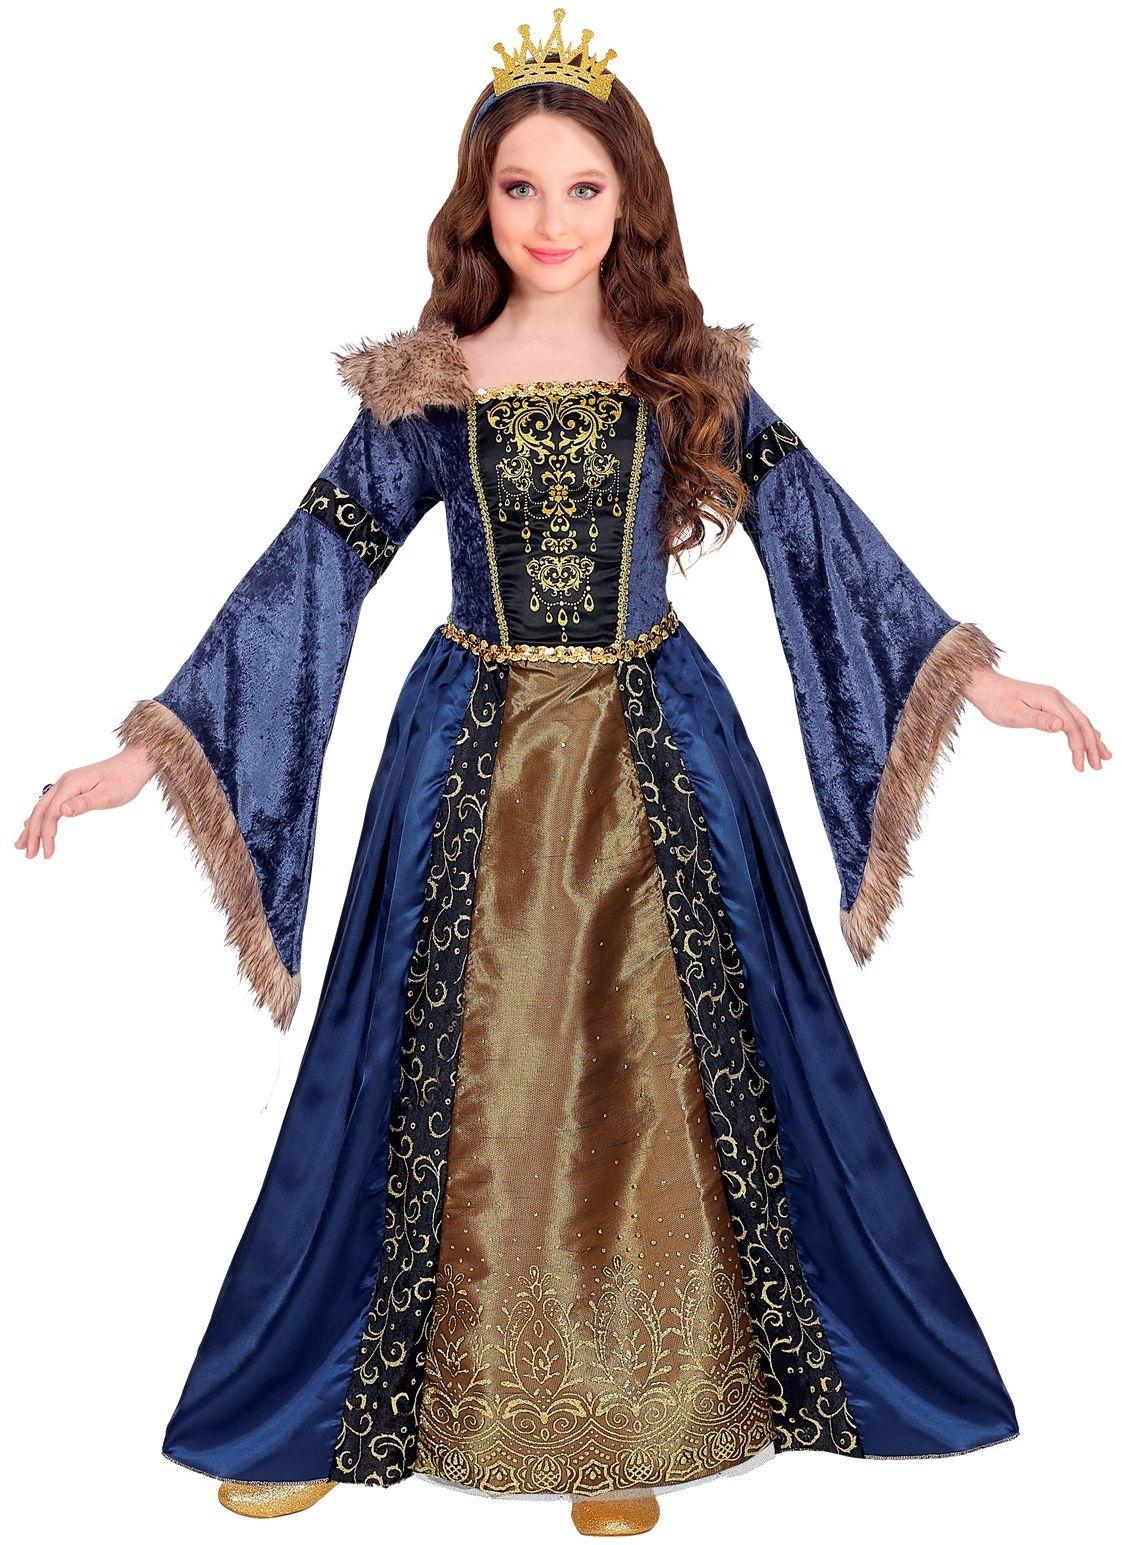 Middeleeuwse koninginnen jurk blauw